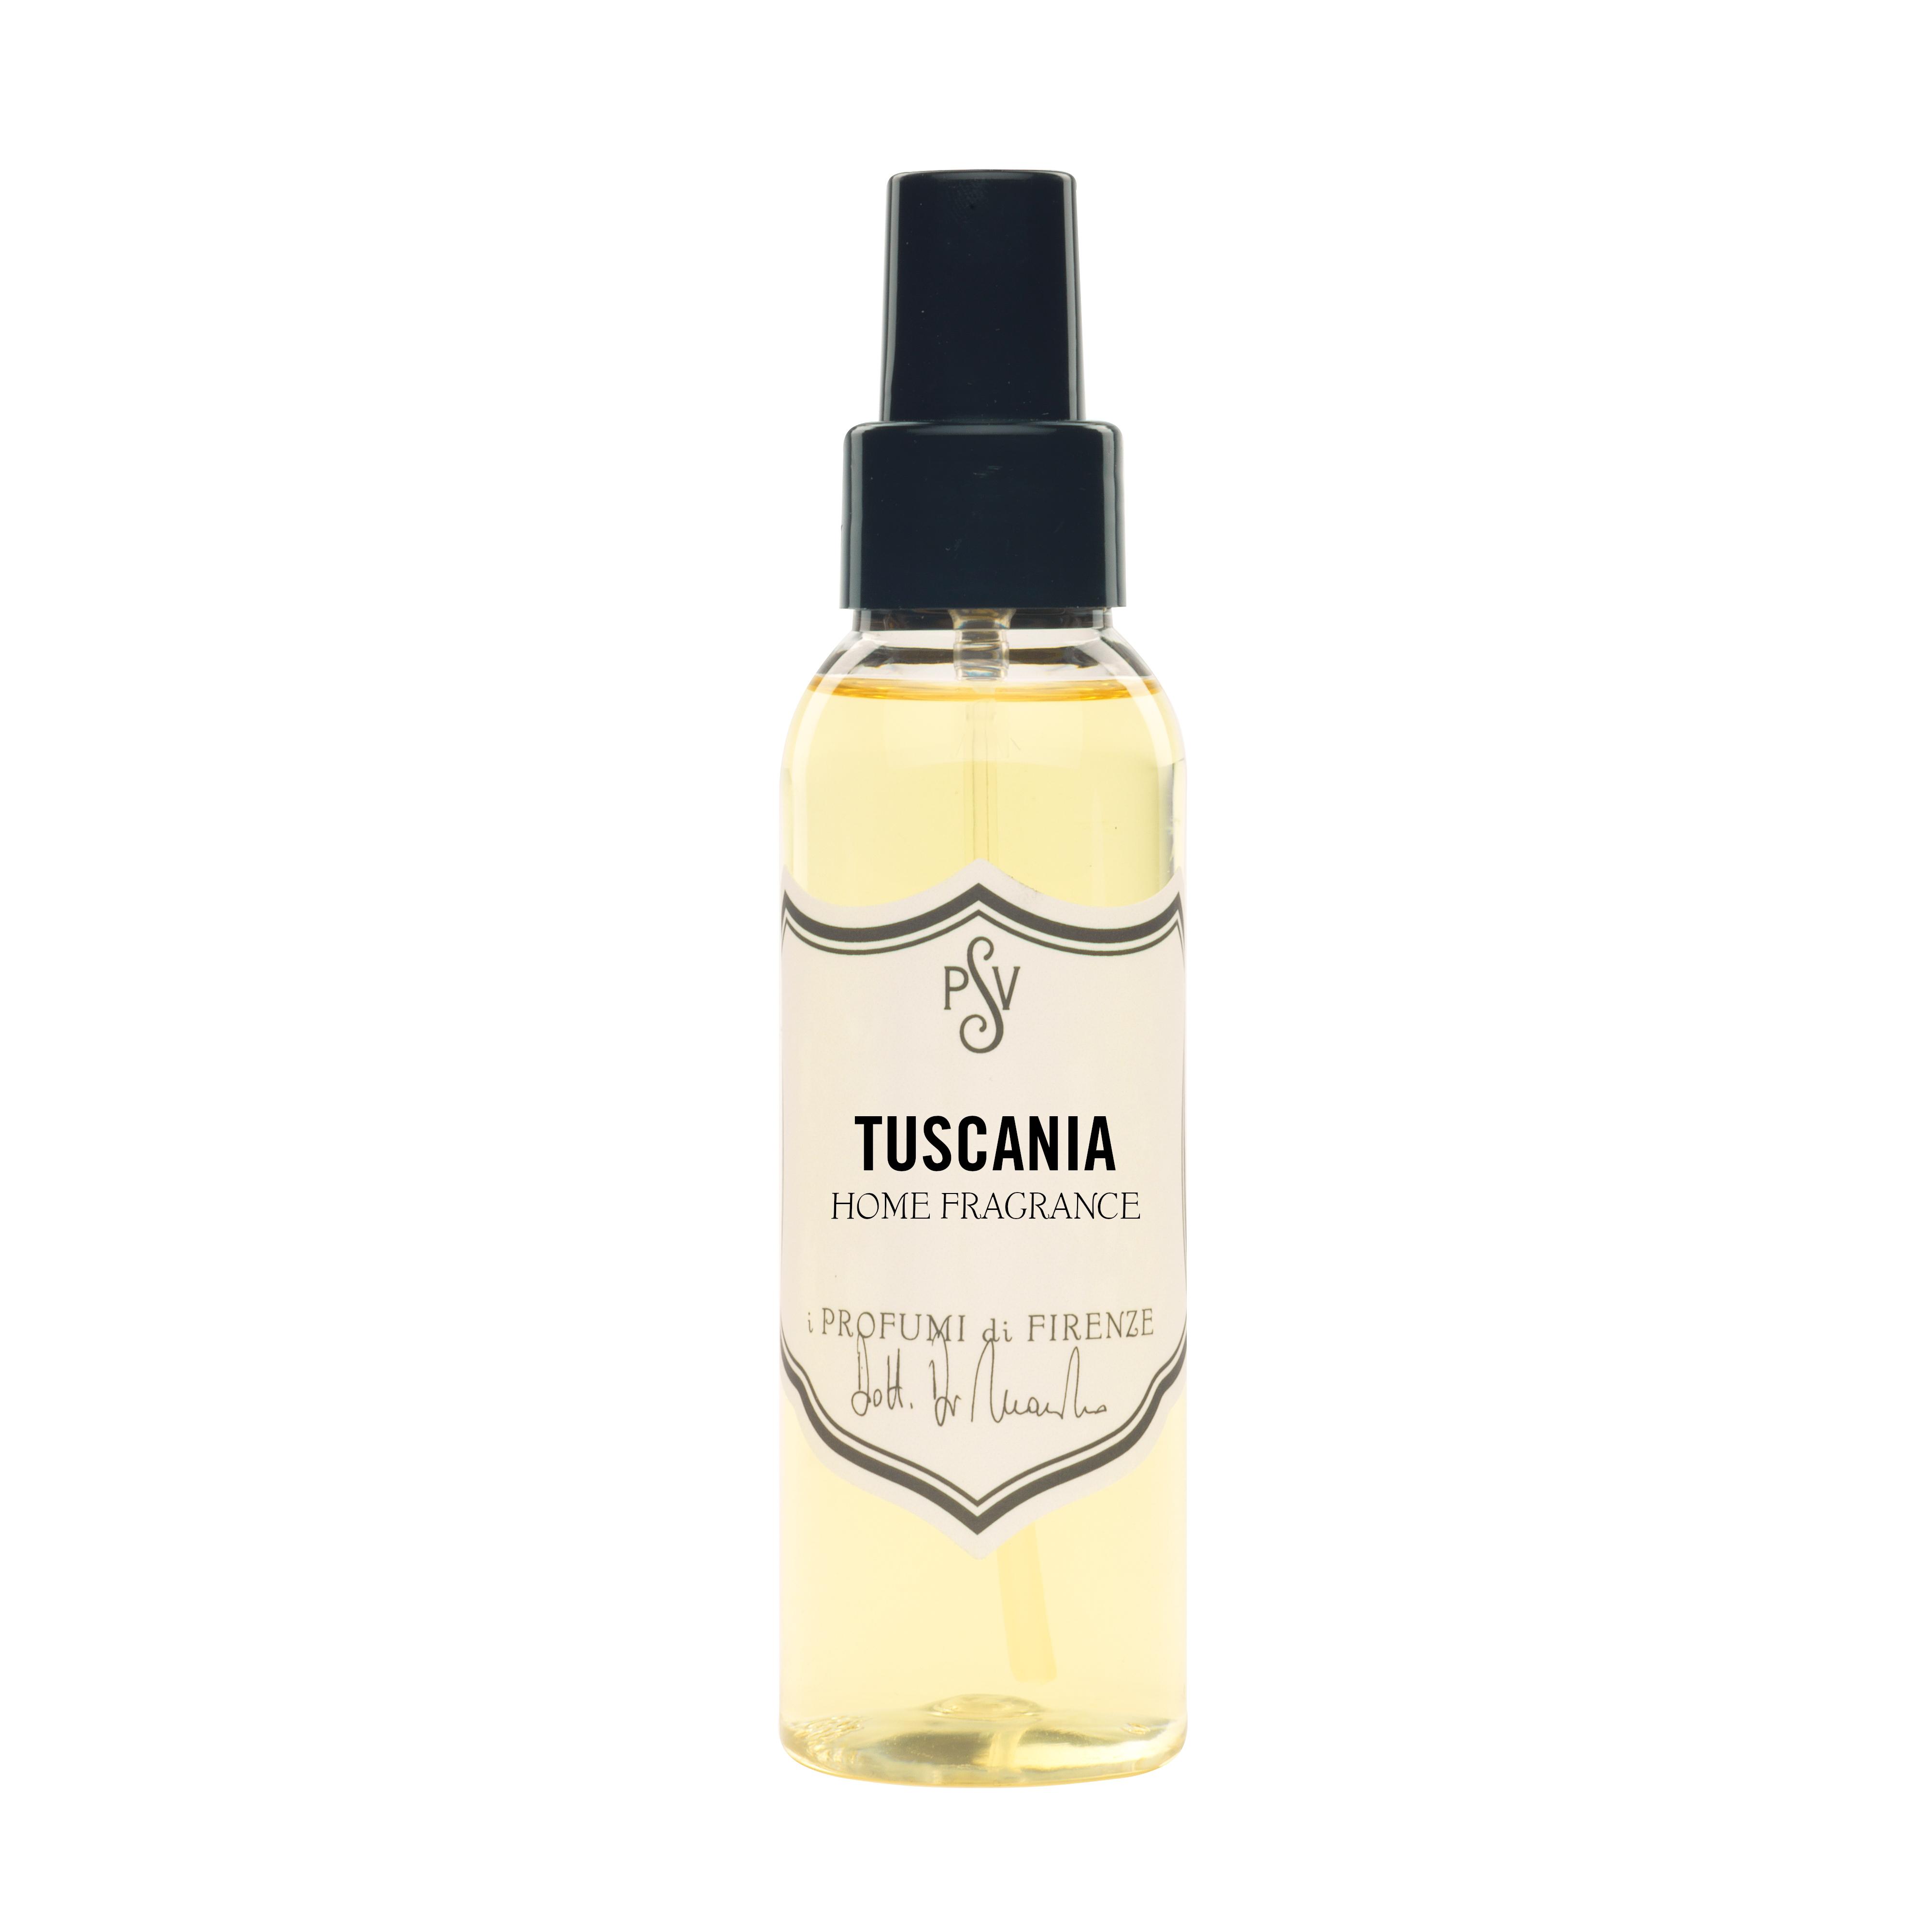 TUSCANIA - Home Fragrance-4451